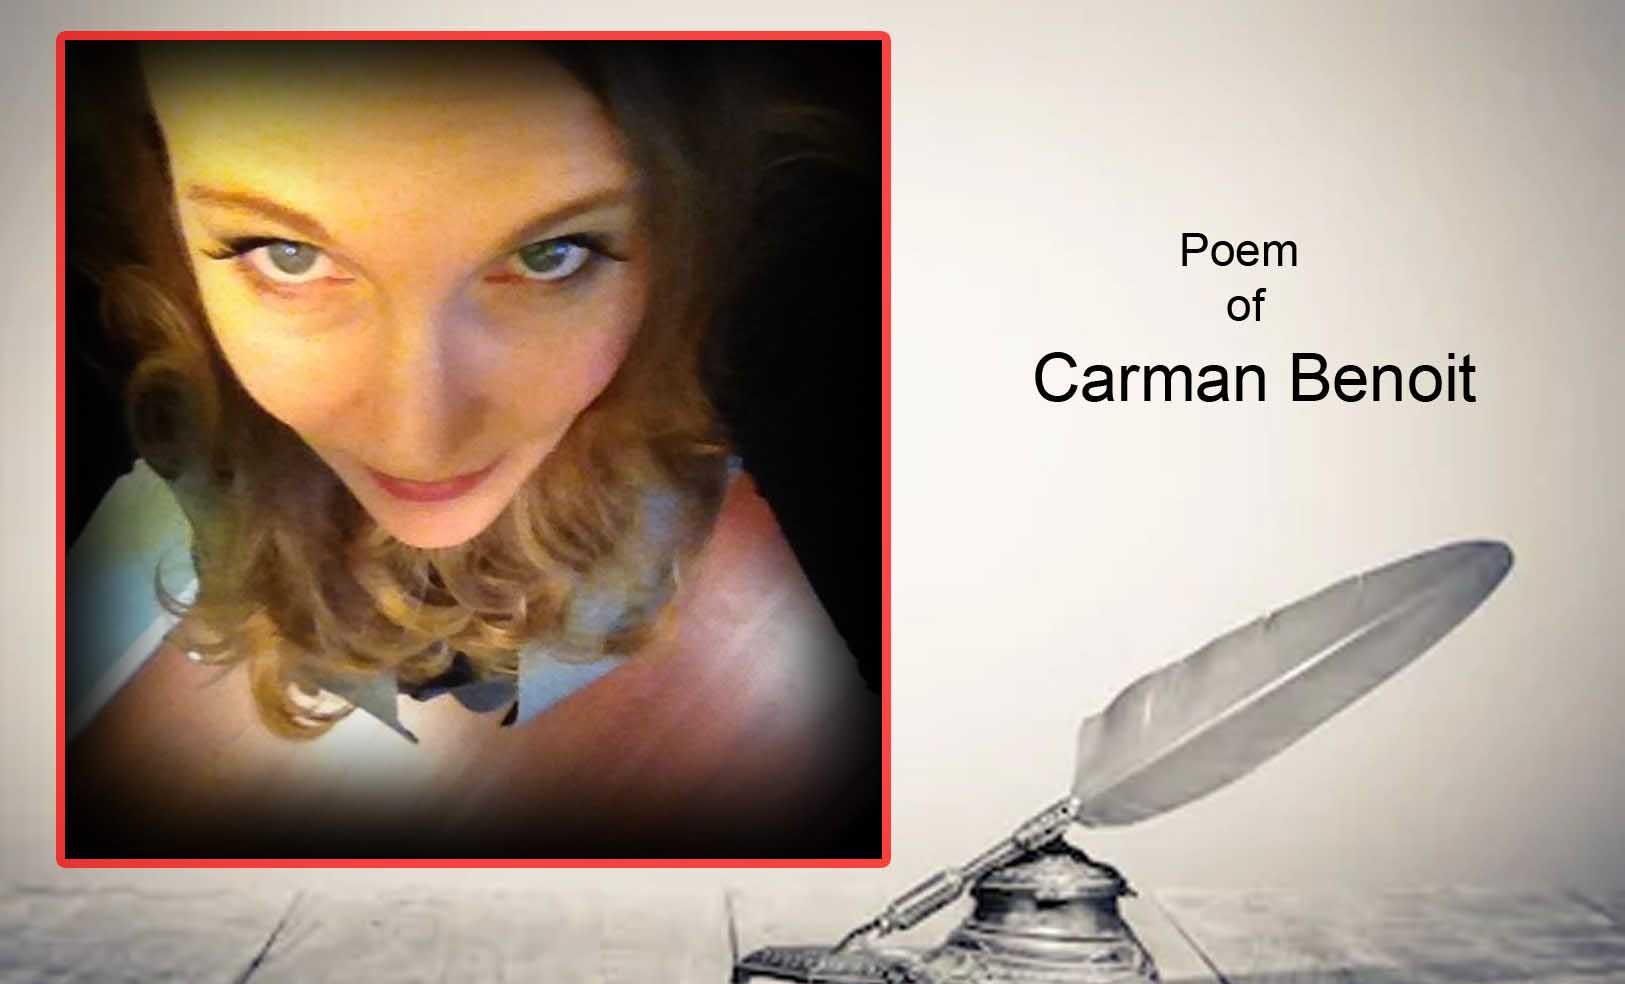 Poems By Carman Benoit